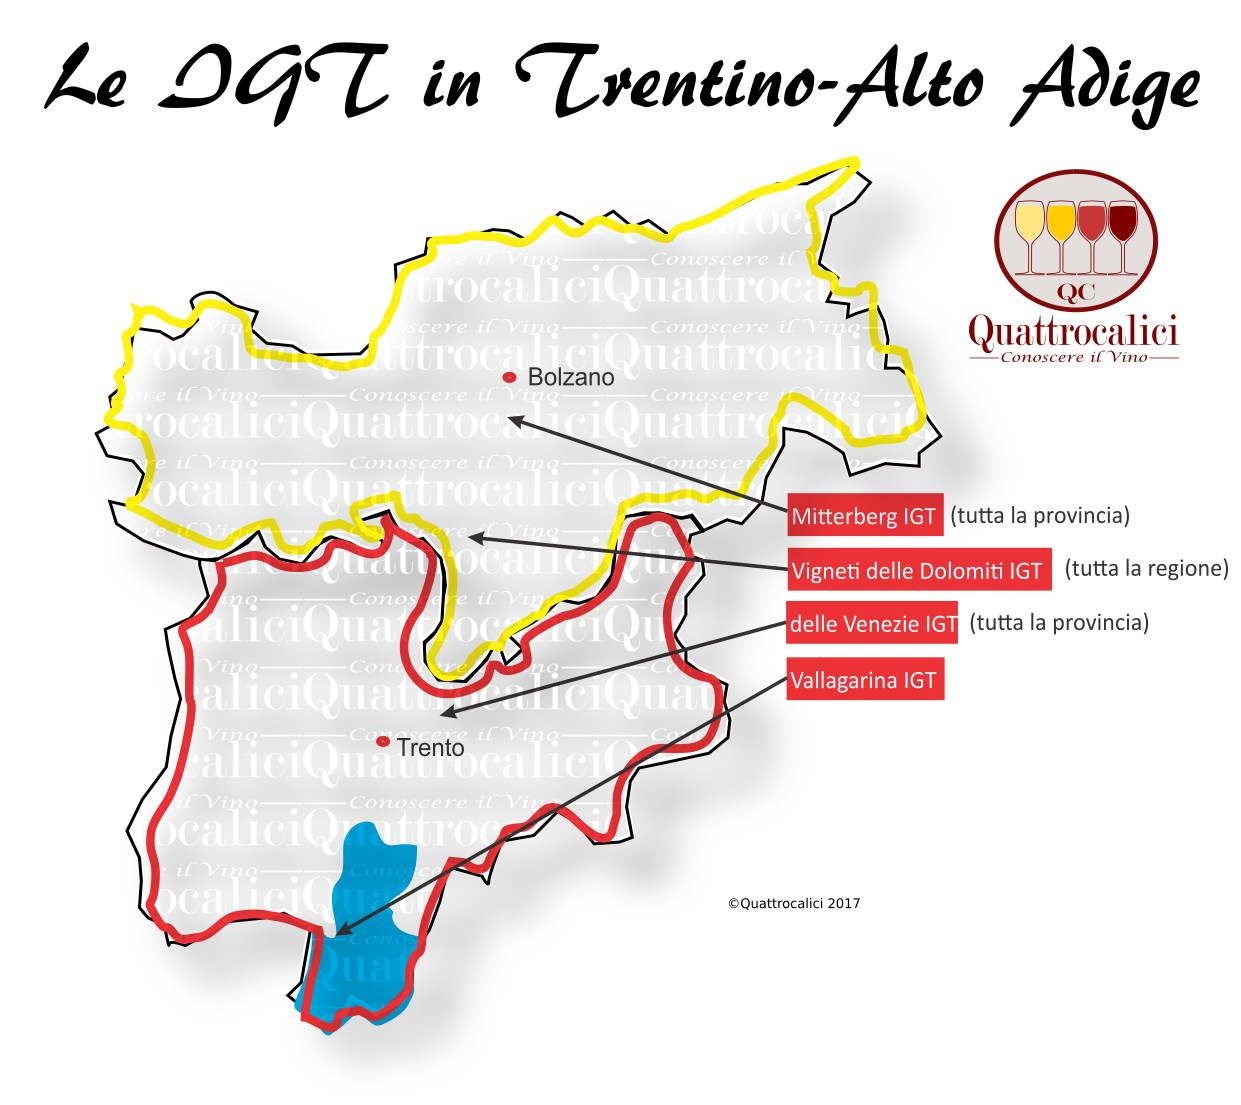 Le IGT in Trentino-Alto Adige